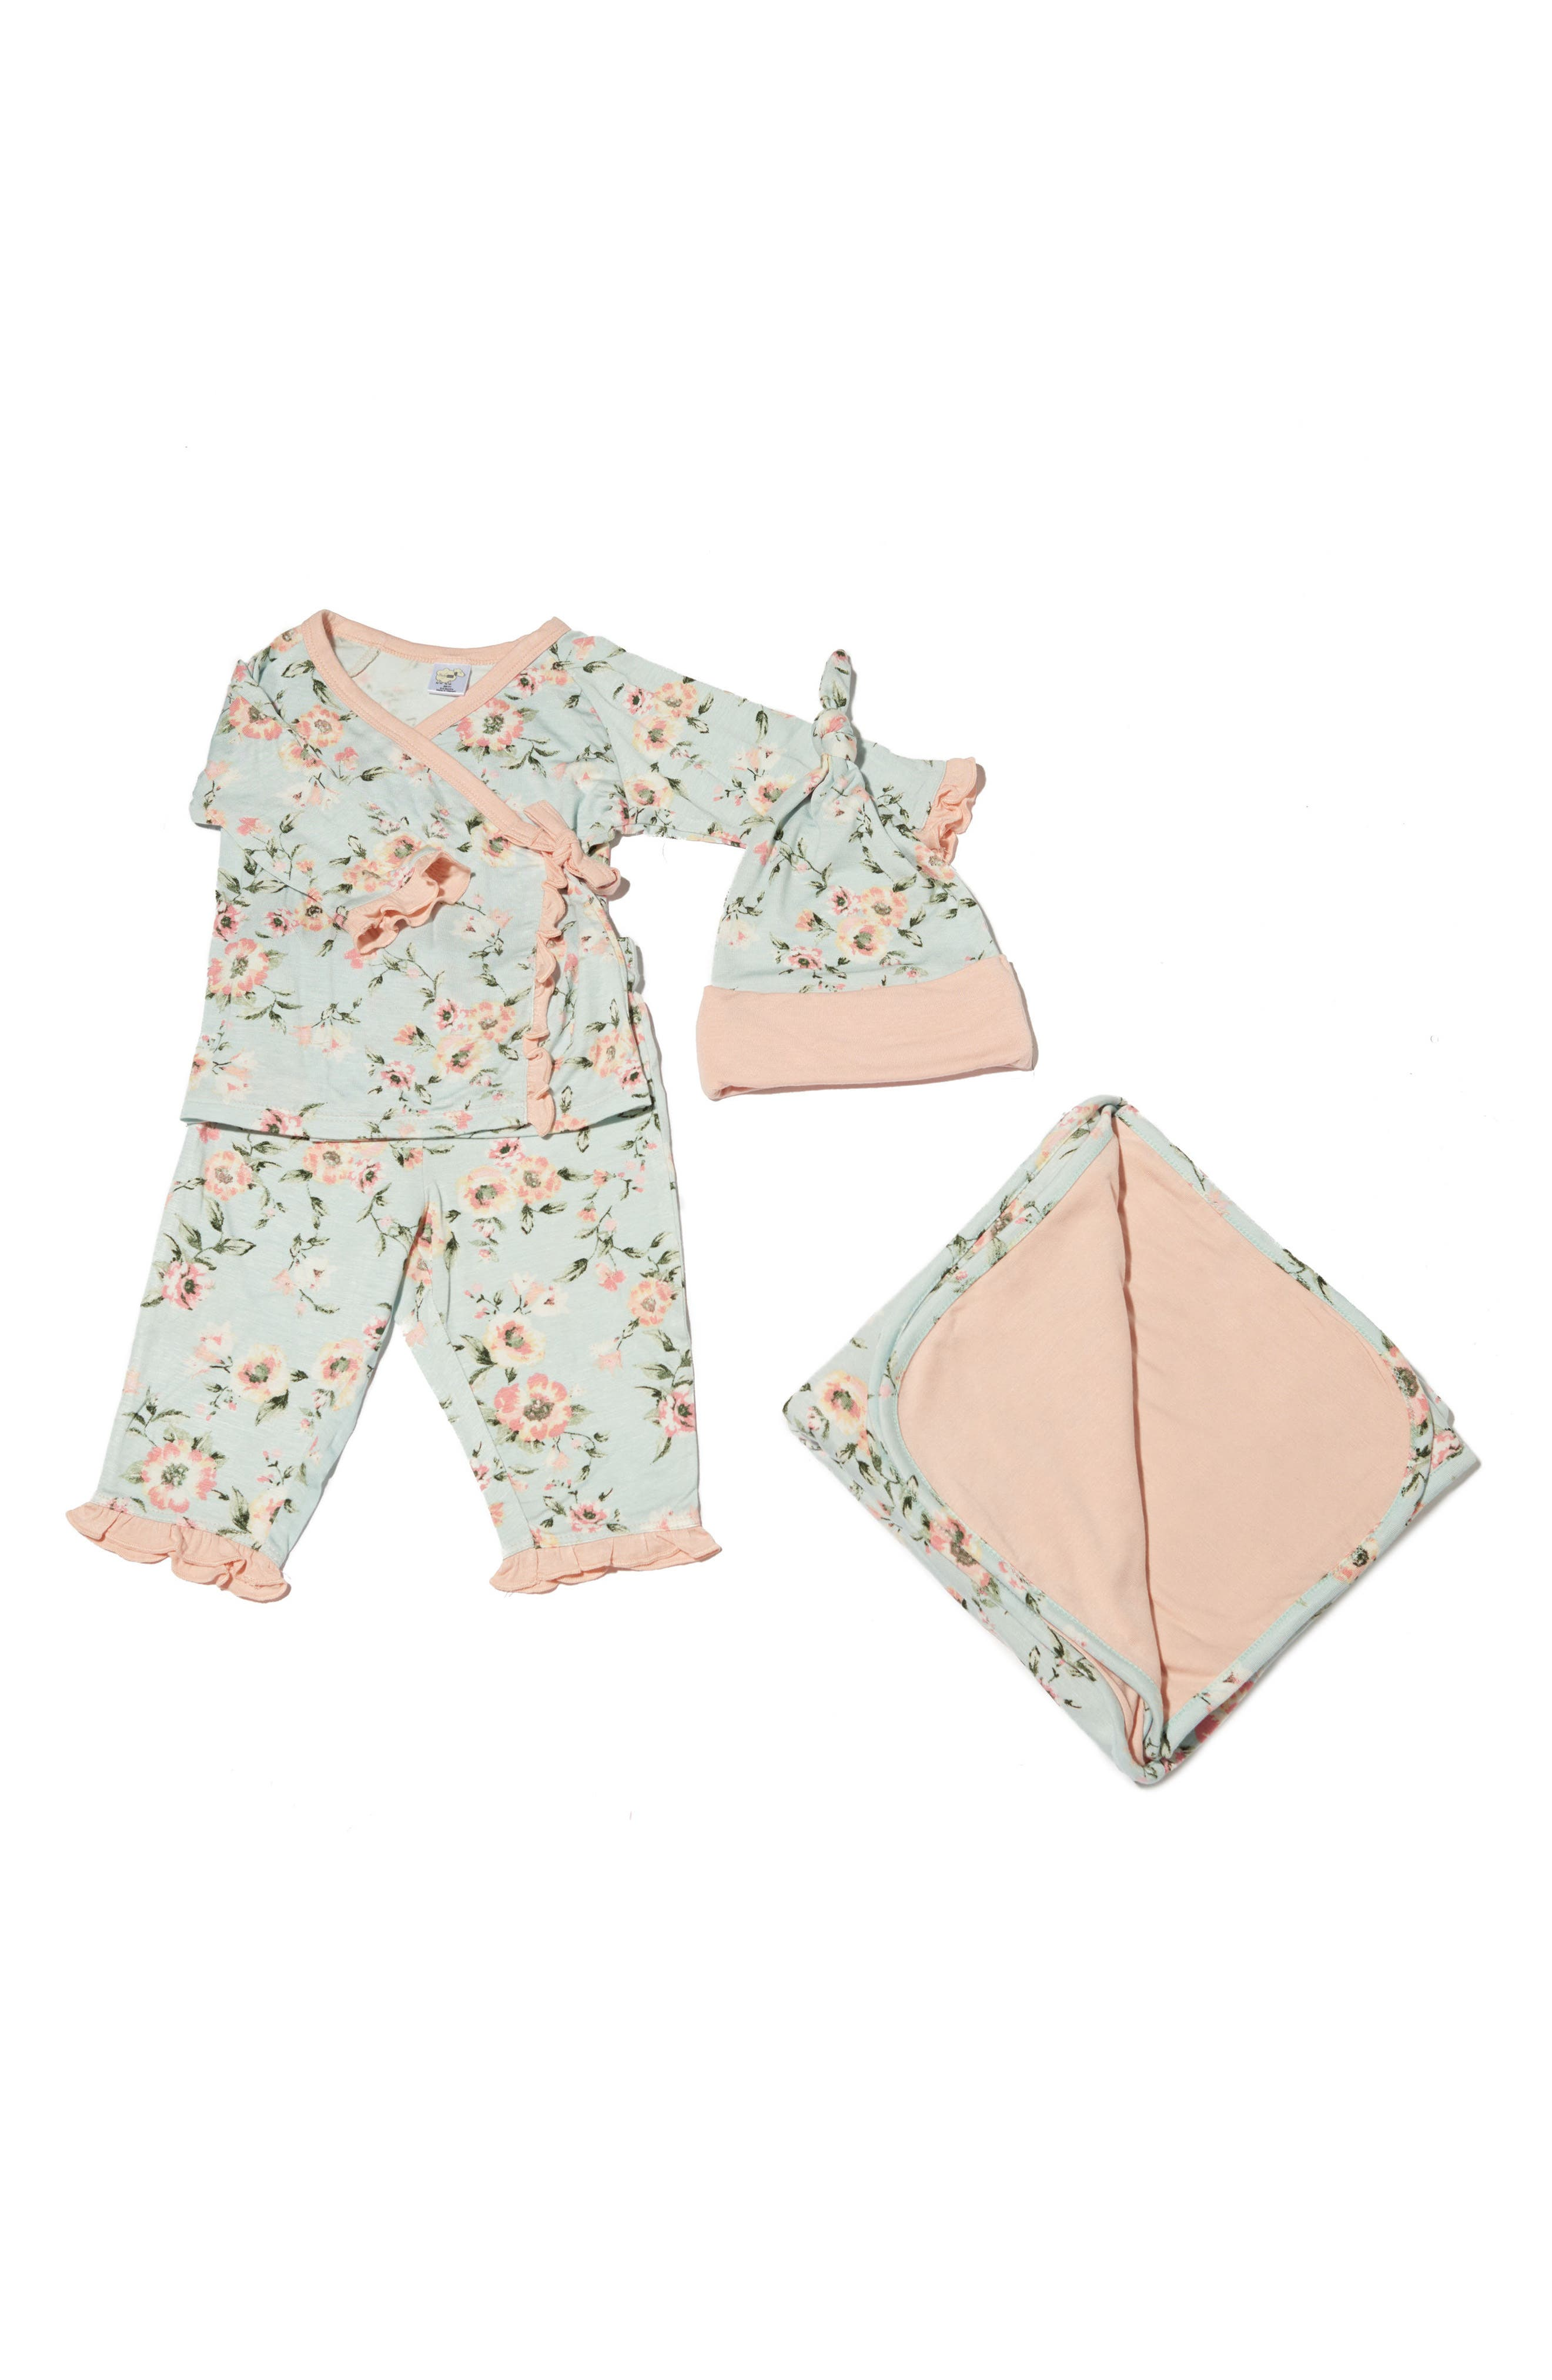 Ruffle Kimono Top, Pants, Hat & Receiving Blanket Set,                             Main thumbnail 1, color,                             451